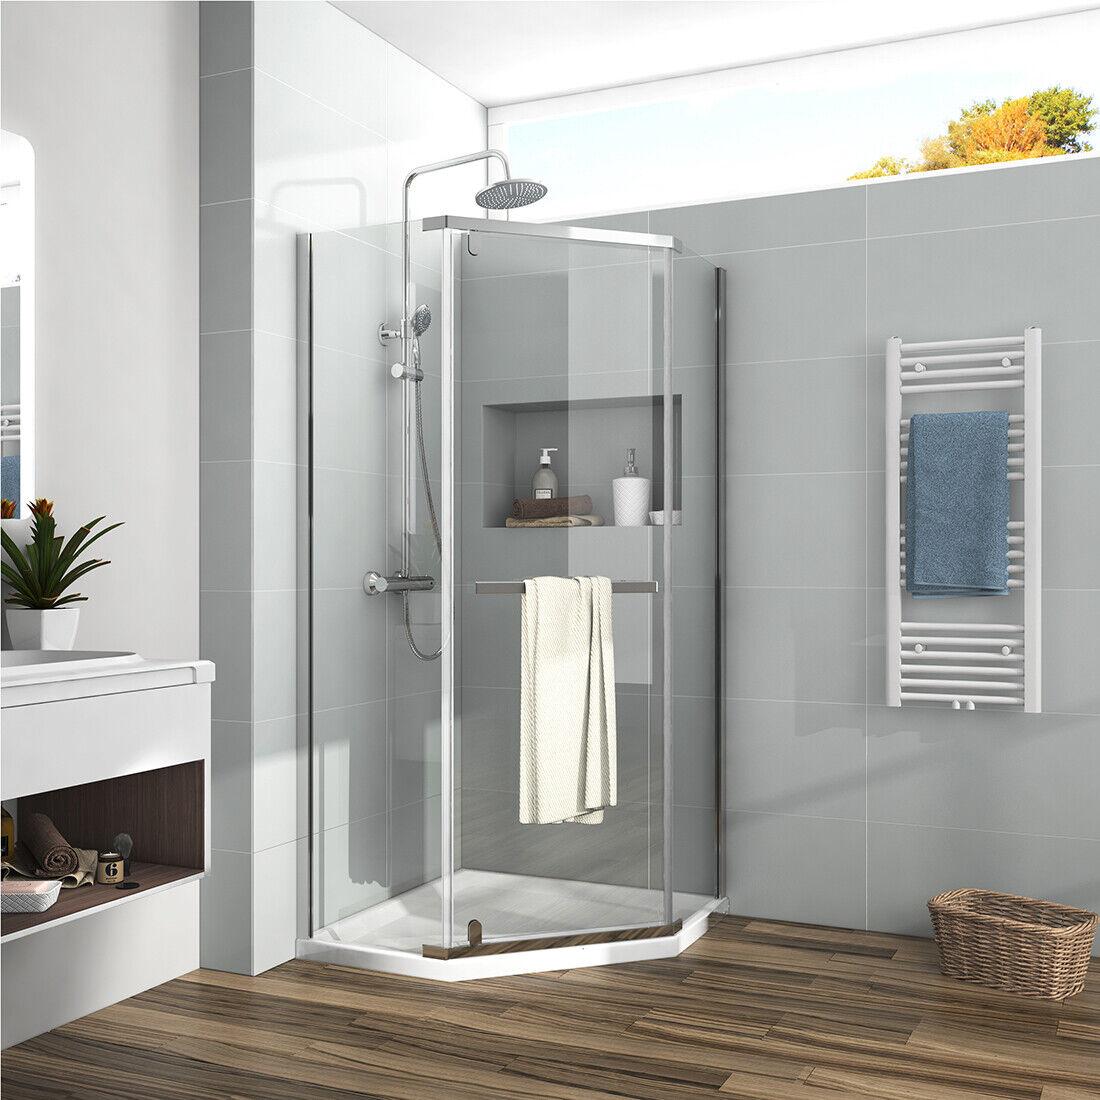 Bath Neo Angle Frameless Pivot Corner Shower Enclosure Chrome 1 4 Safety Glass